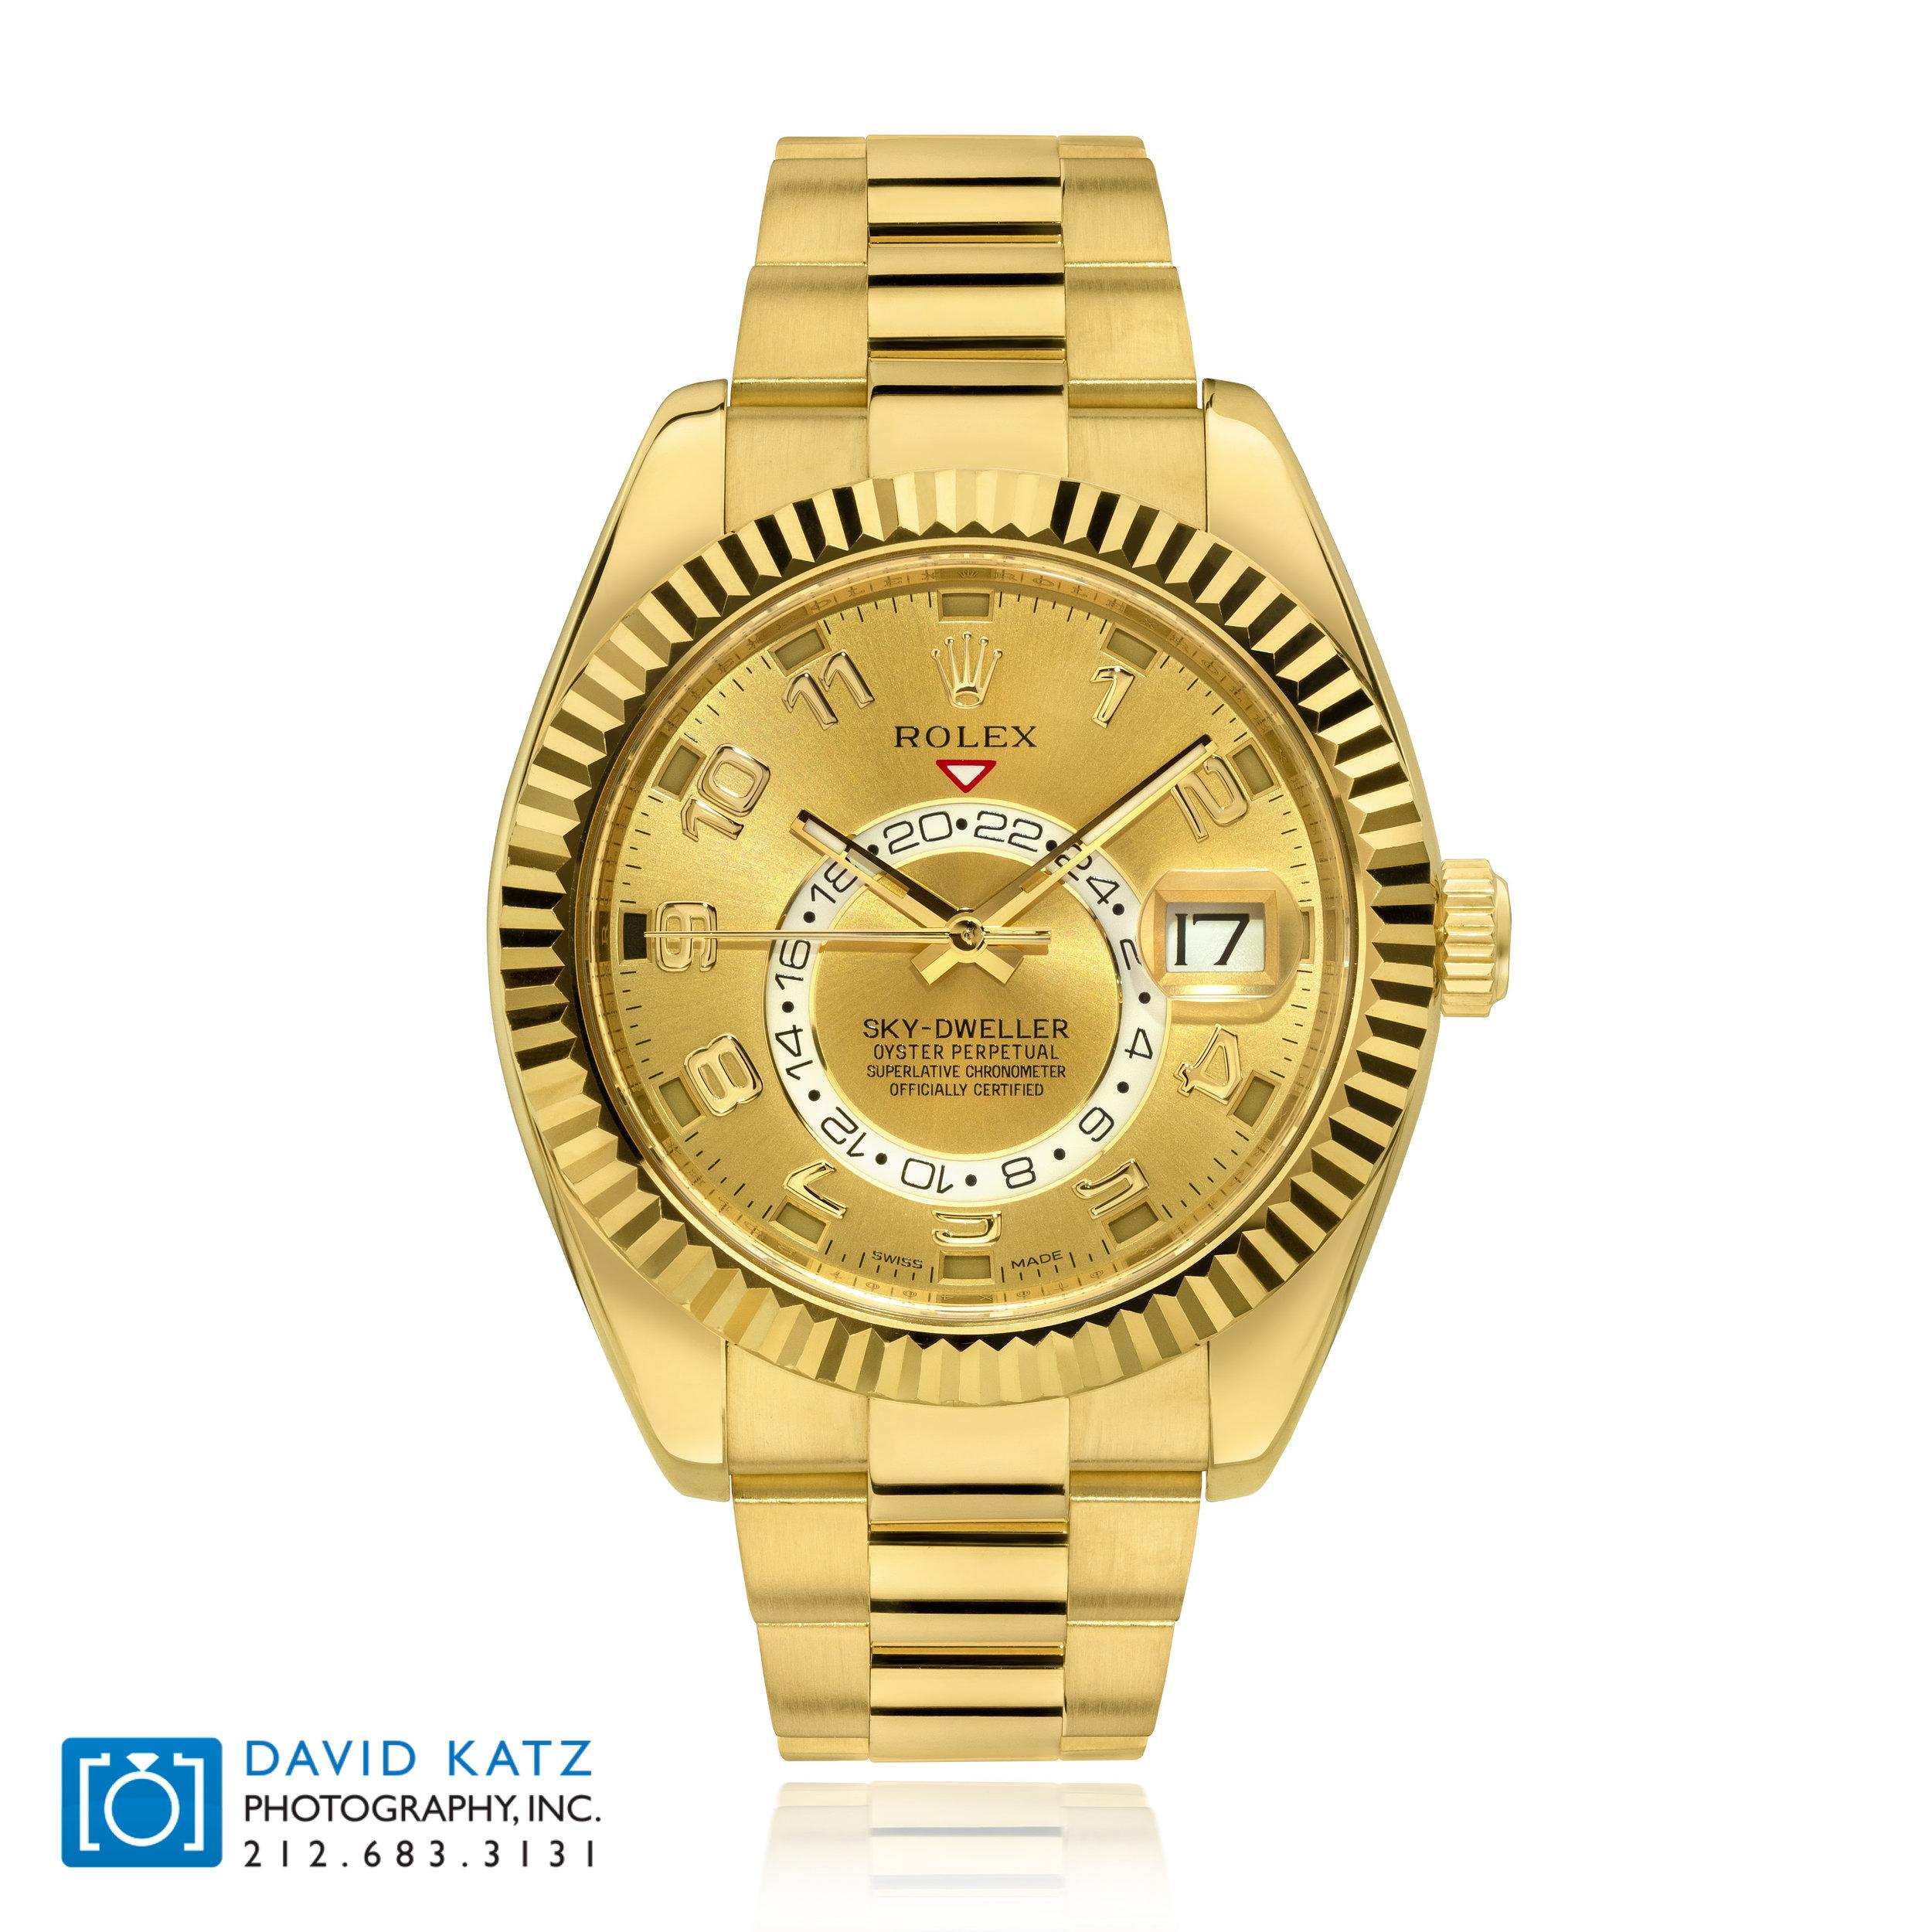 Sky-Dweller Rolex Yellow Gold Watch Color Correct.jpg